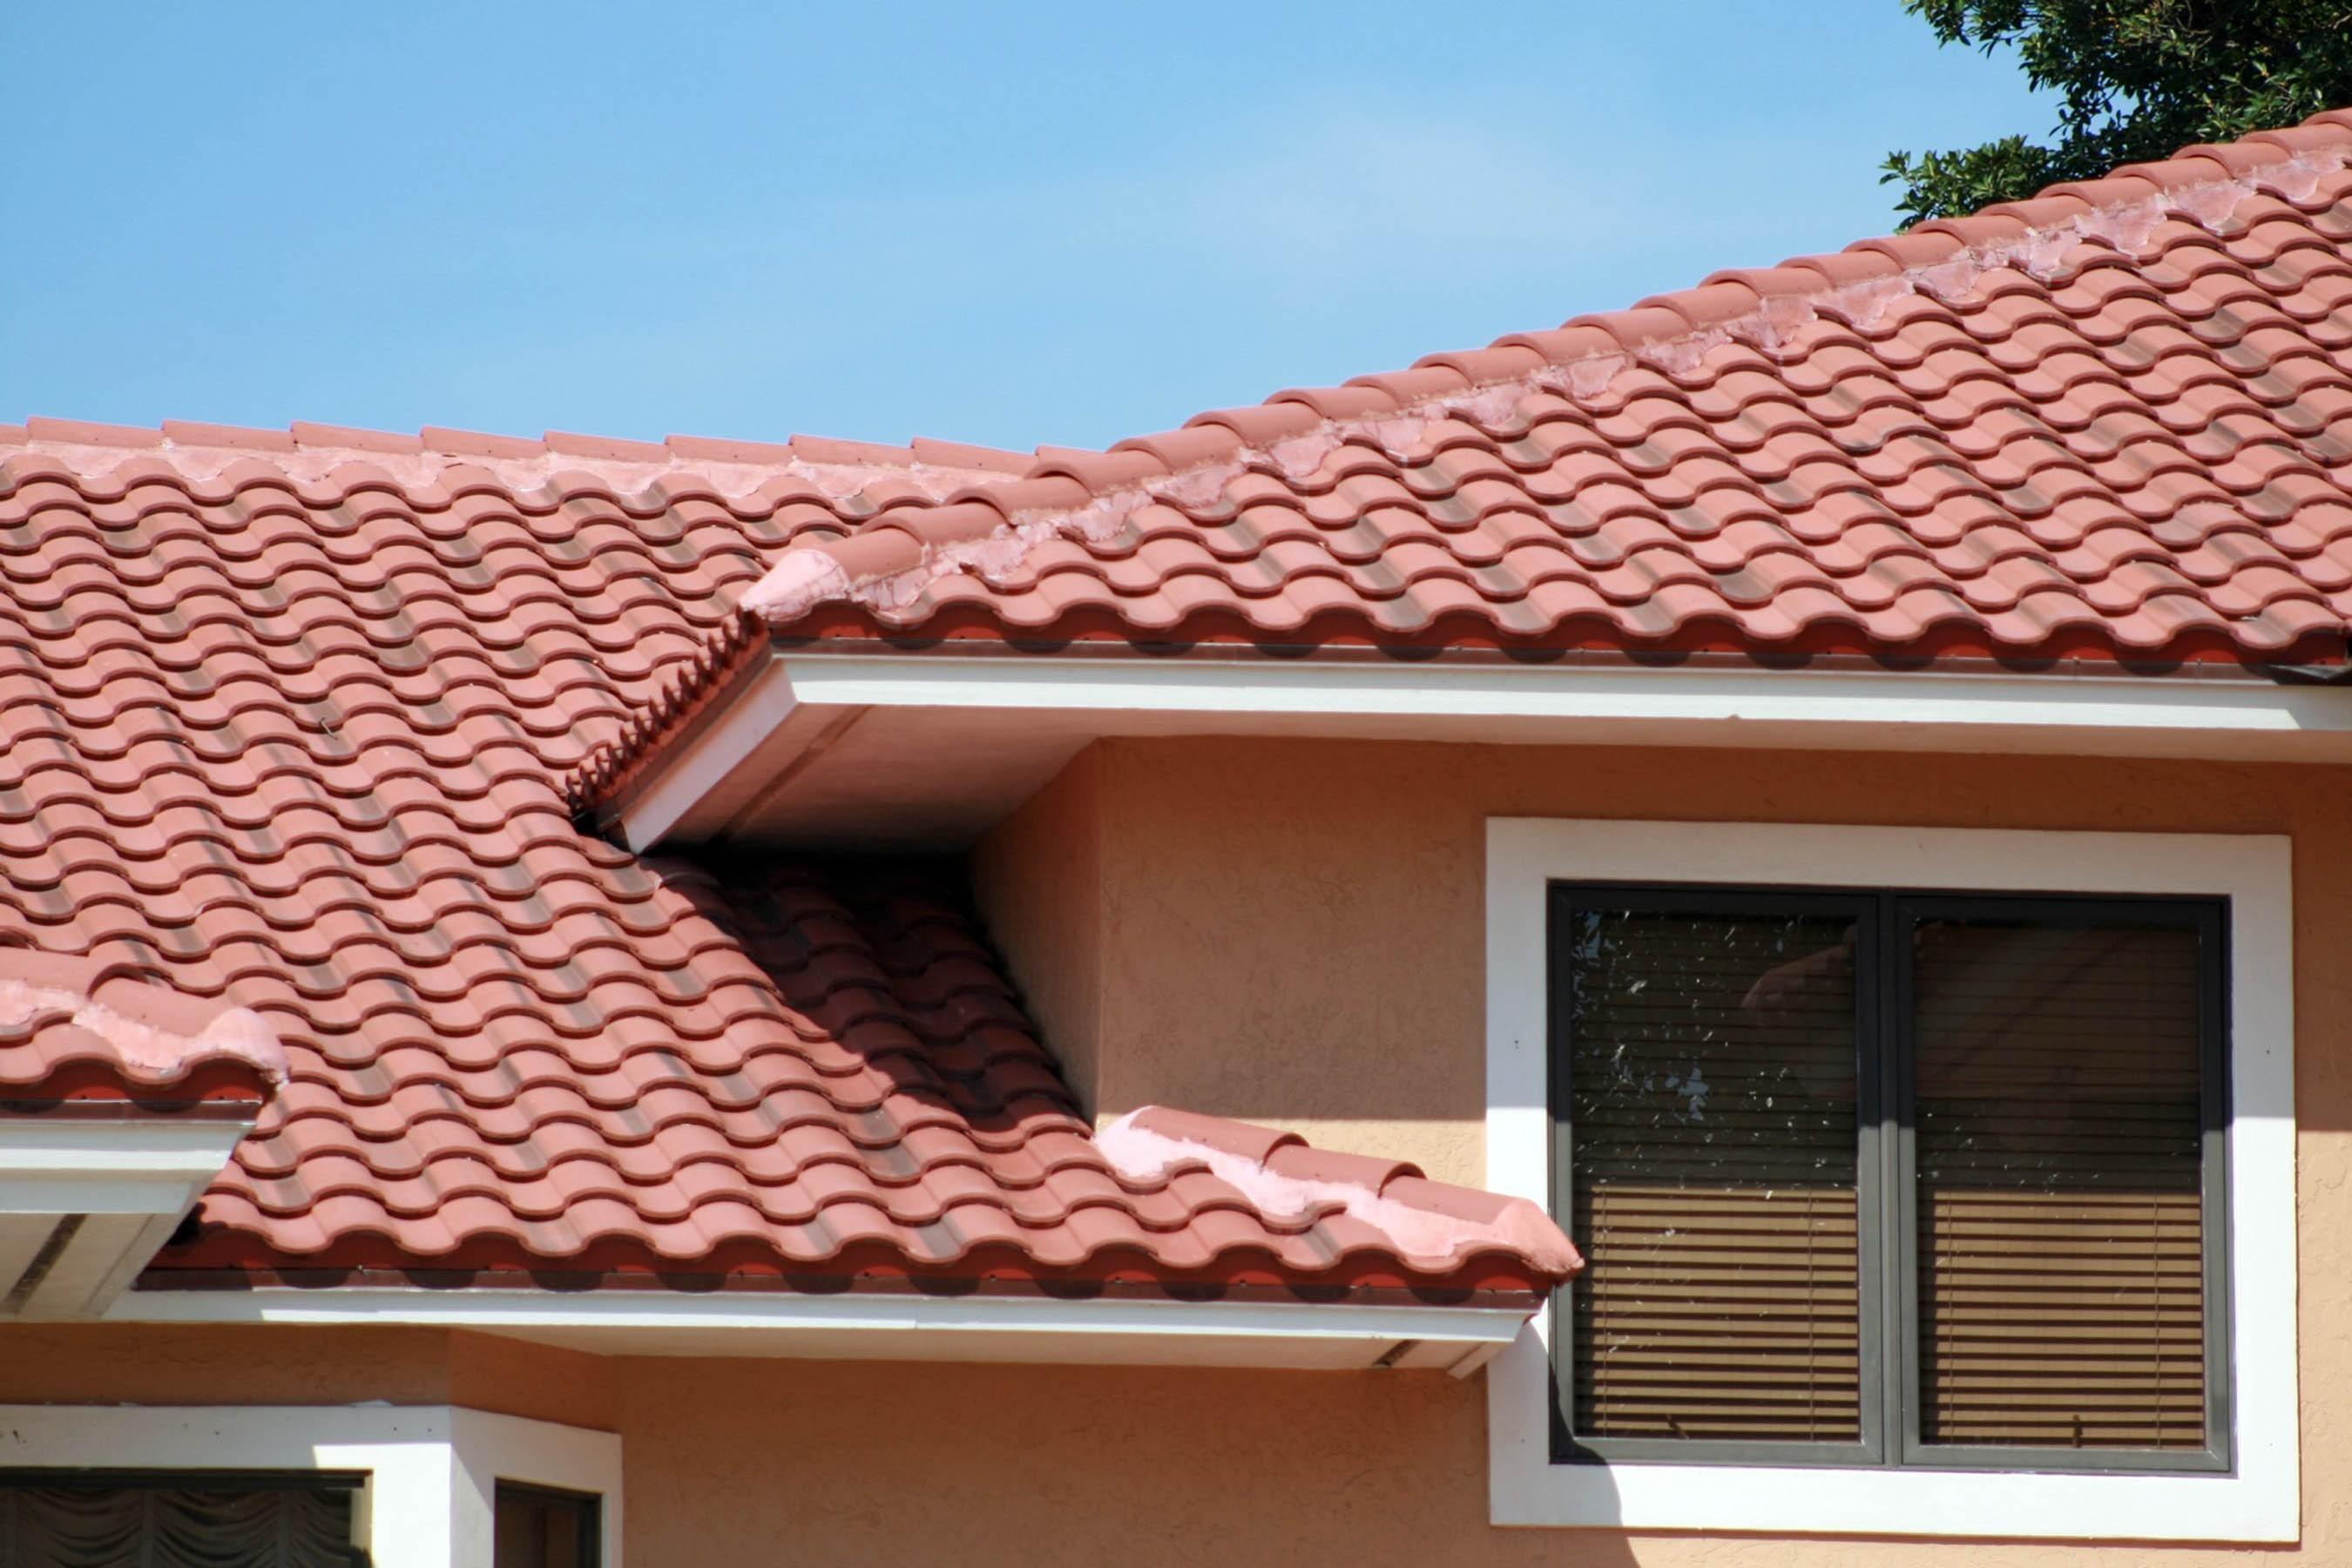 Spanish Roofing Tile Diggerslist